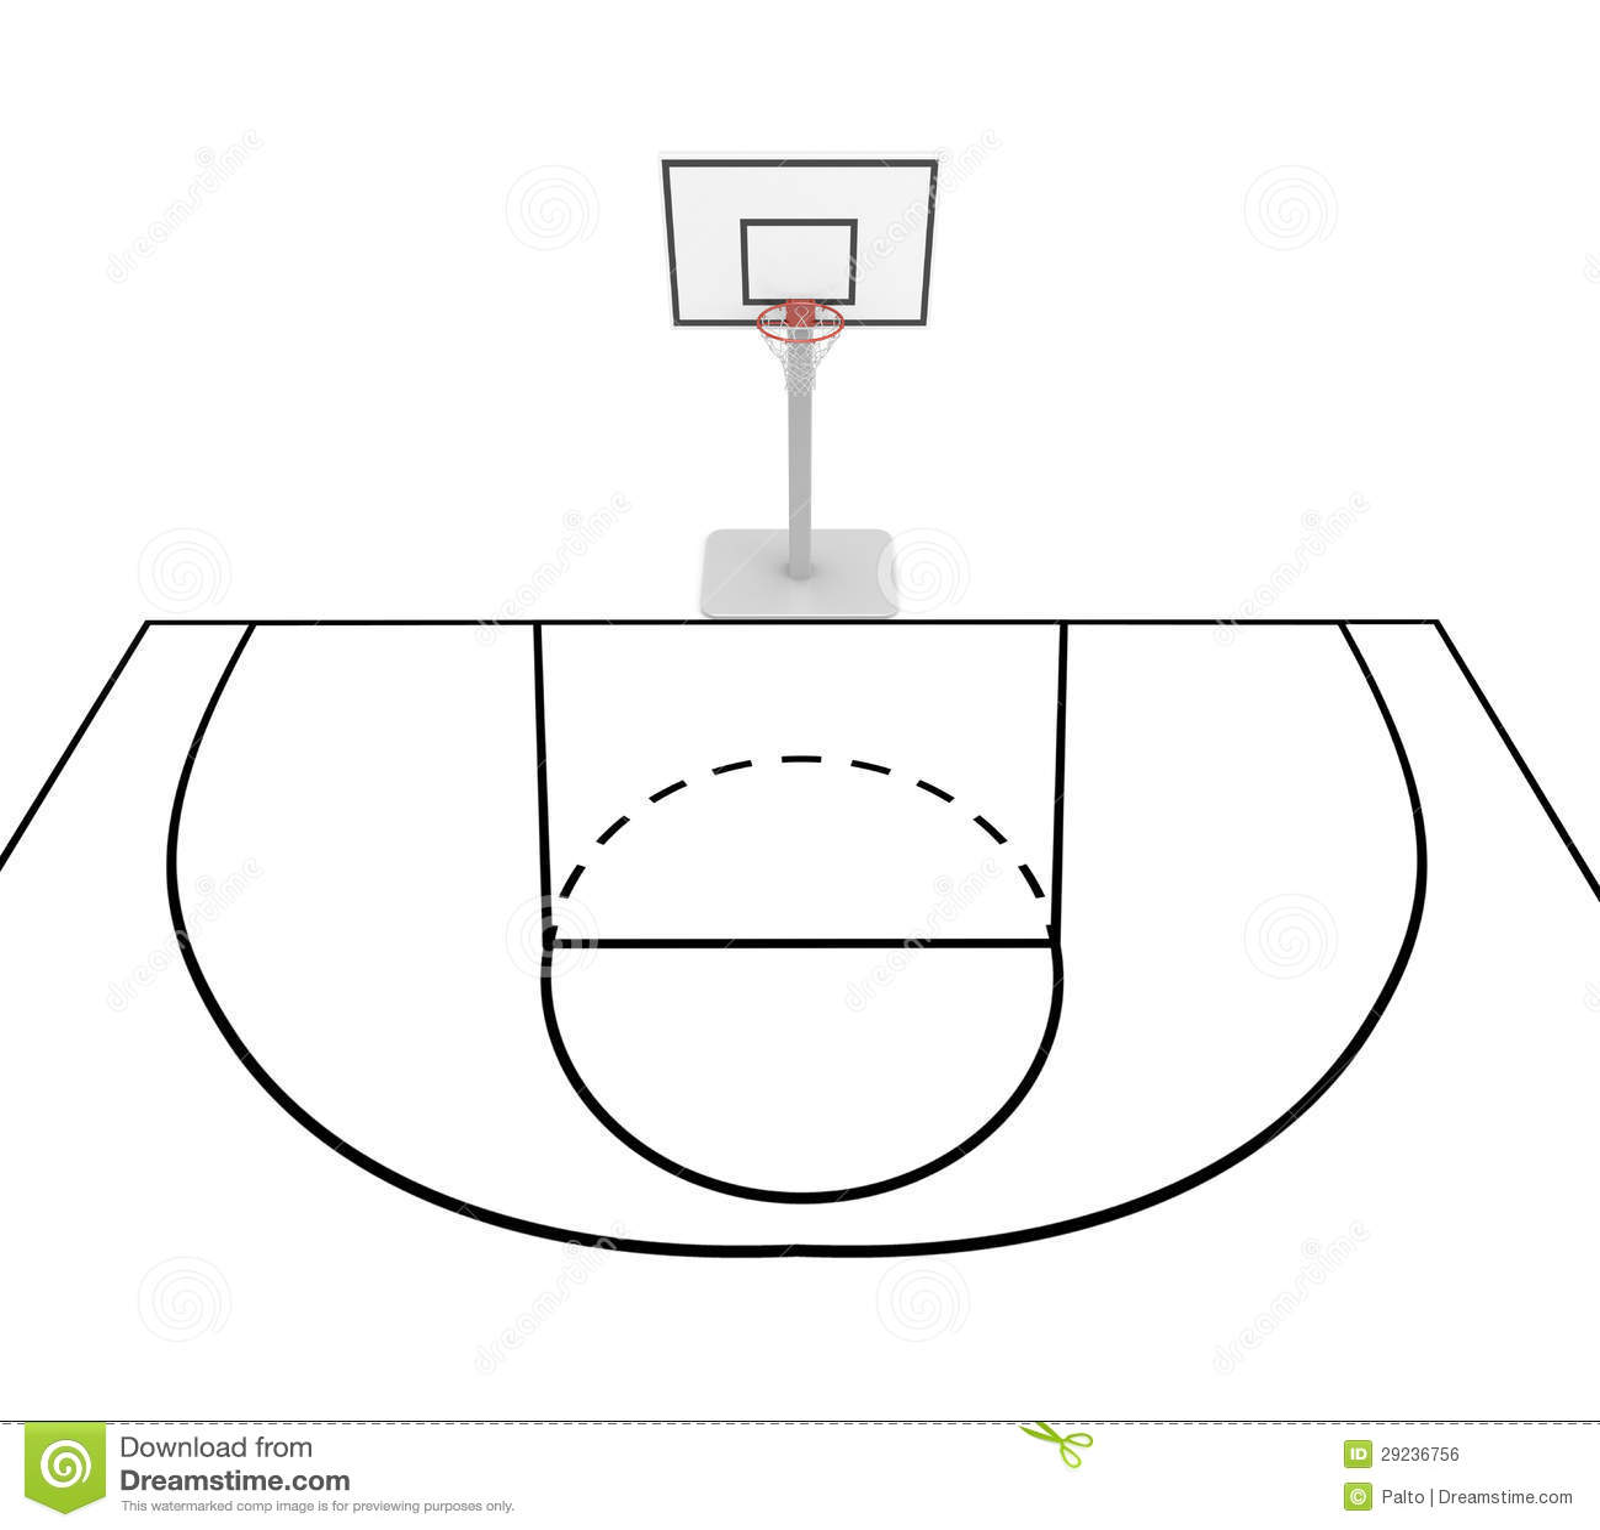 Basketball Court Royalty Free Stock Image - Image: 29236756